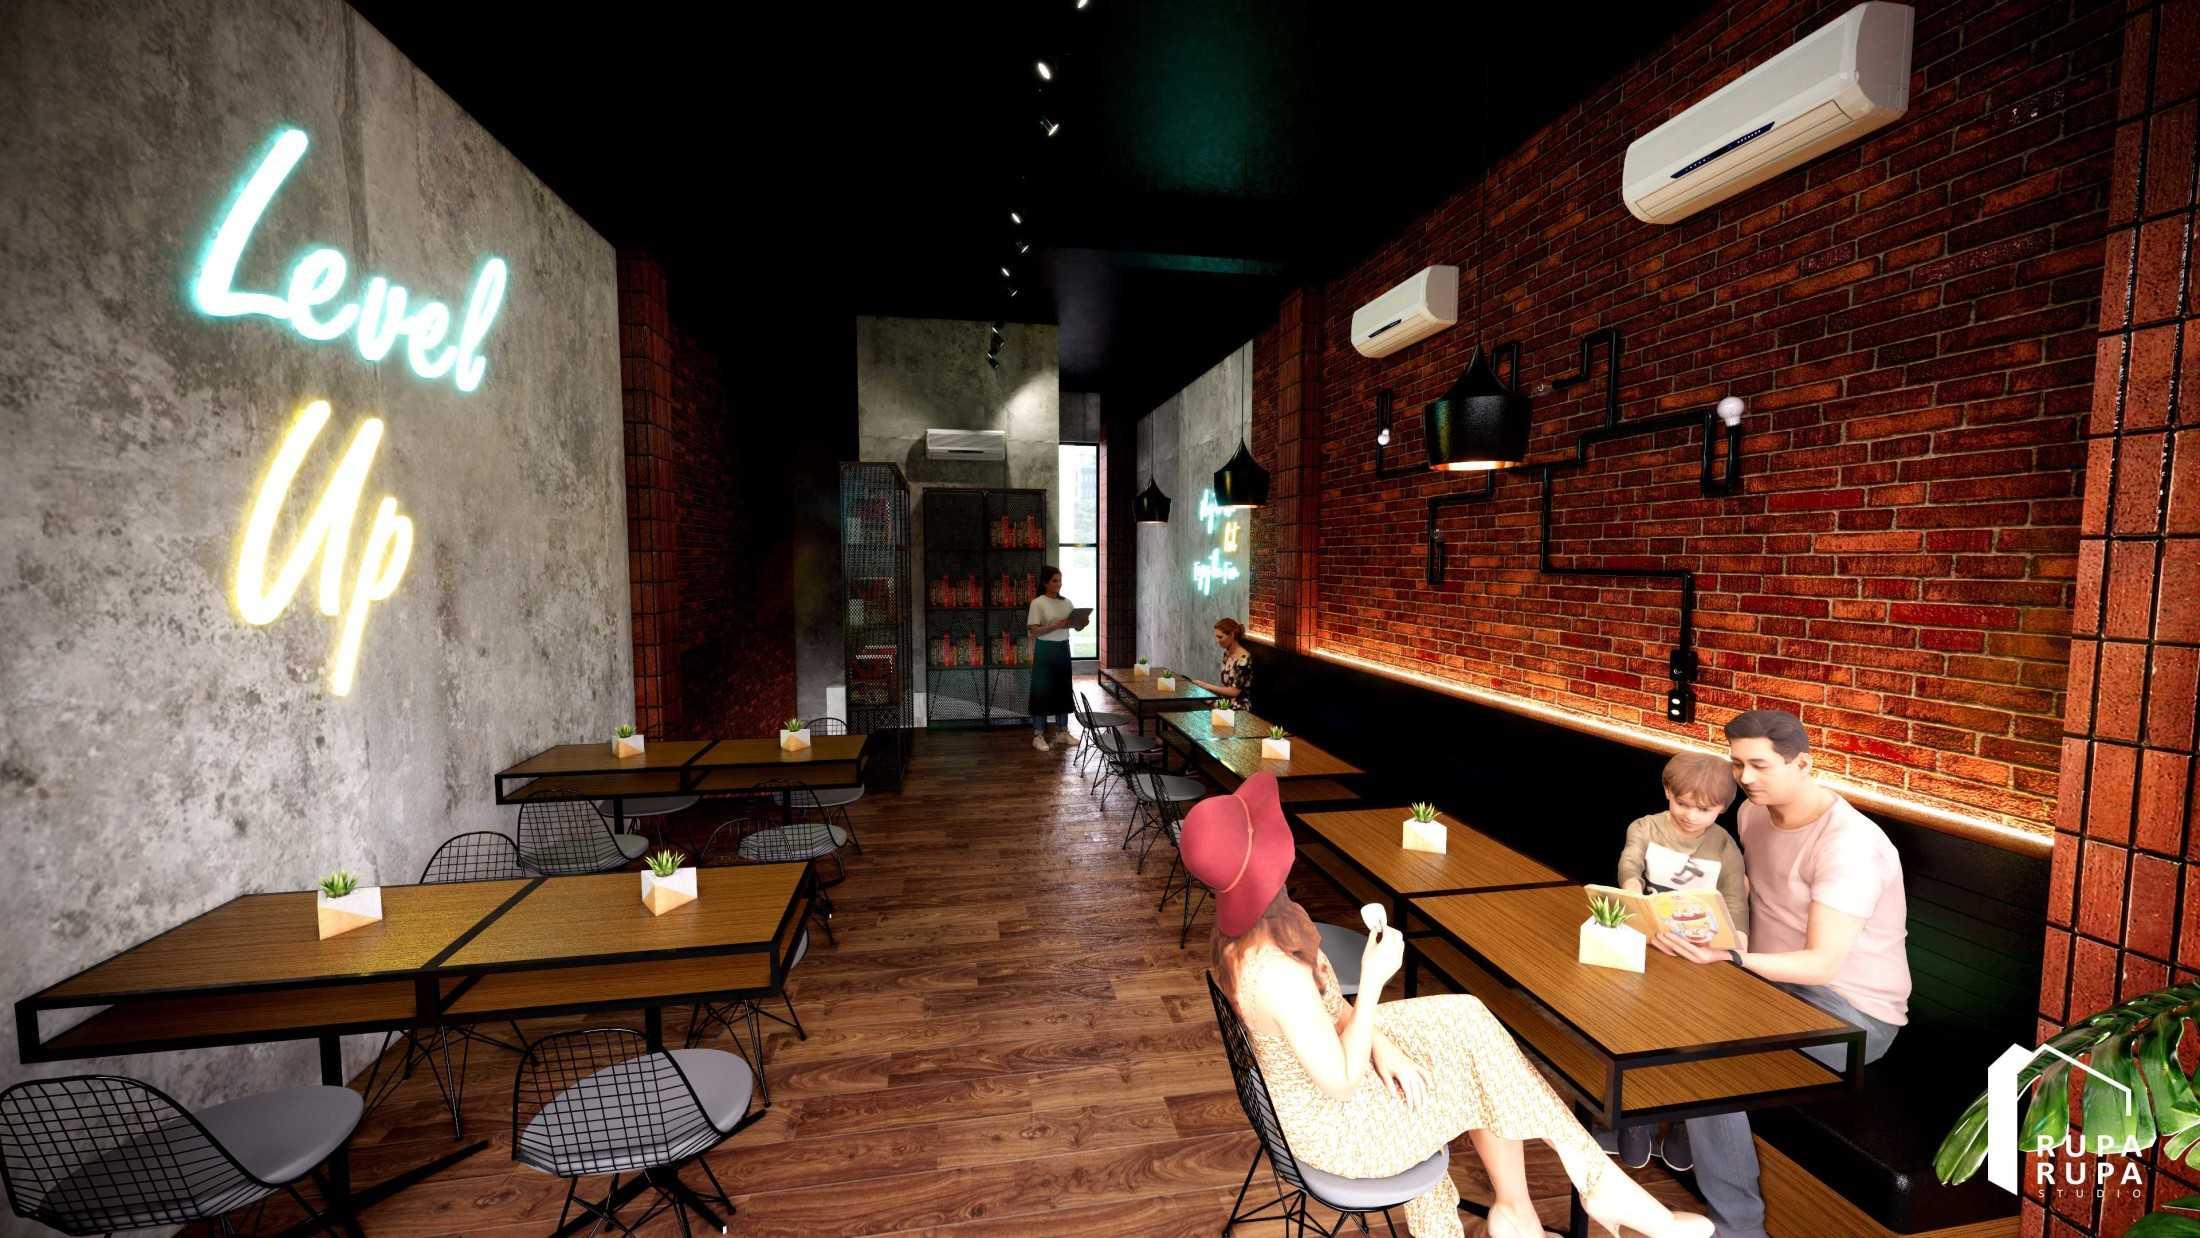 Studio Rupa Rupa Drupadi Corner Cafe Bali, Indonesia Bali, Indonesia Studio-Rupa-Rupa-Drupadi-Corner-Cafe  88061